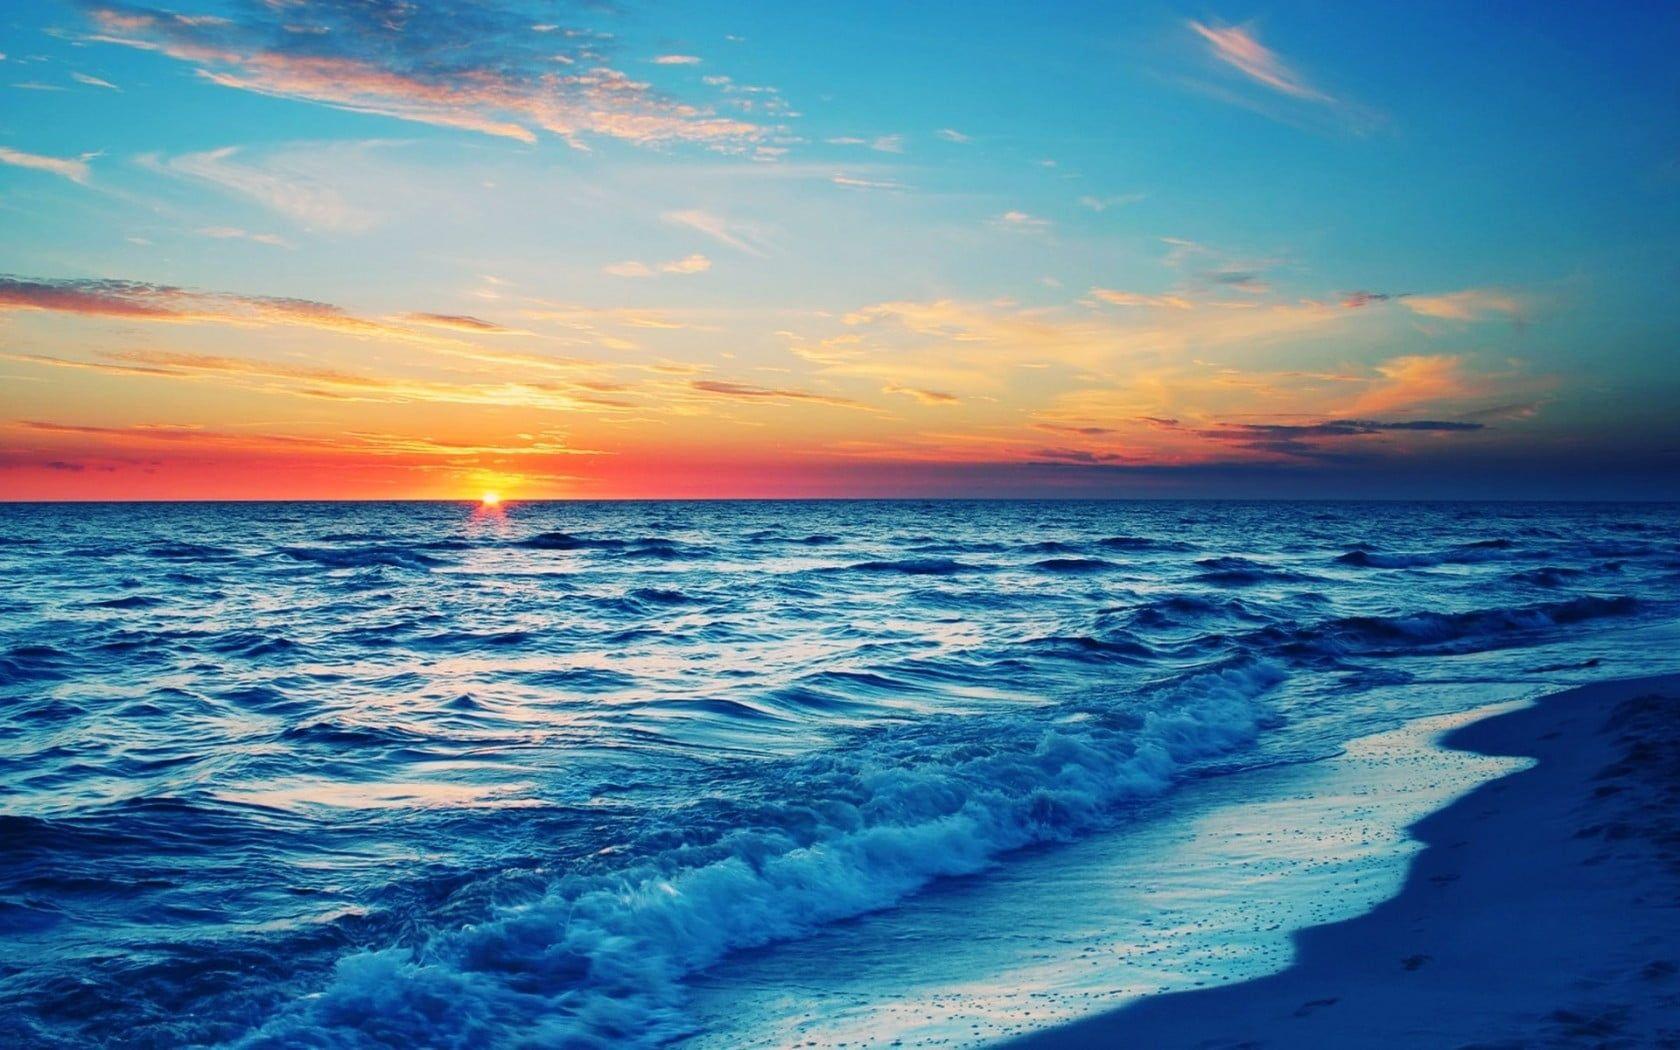 Beach Shore Beach Sunset Coast Waves Sea 720p Wallpaper Hdwallpaper Desktop Beach Sunset Wallpaper Beach Wallpaper Wallpaper Landscape